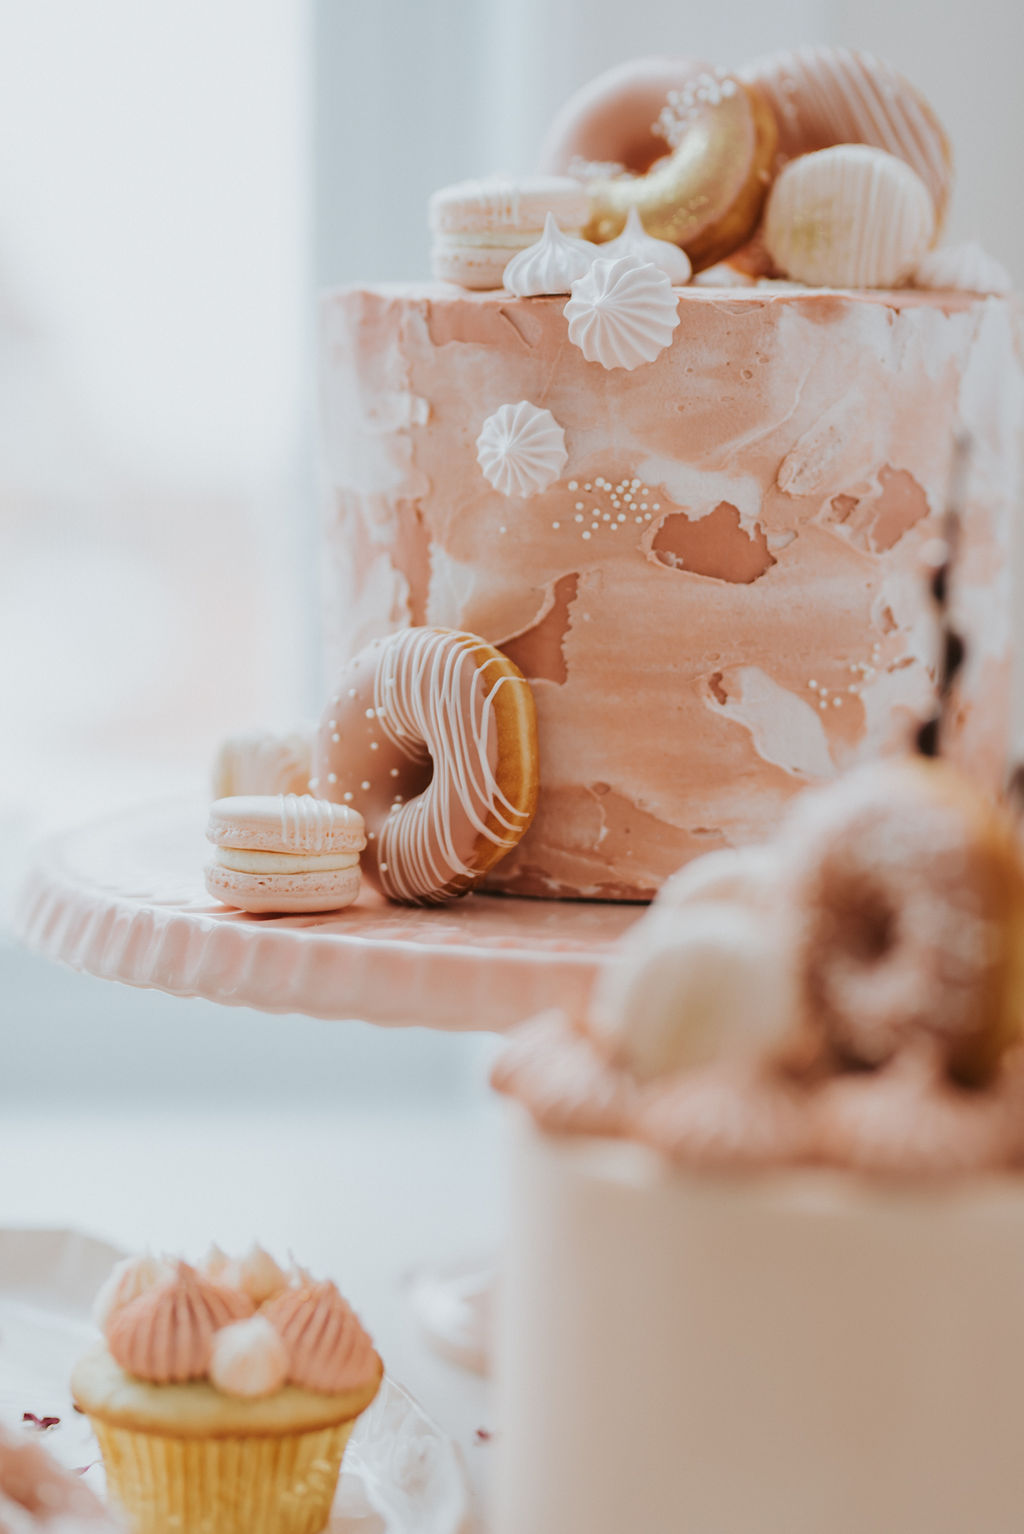 babyshower_cake_cupkateandco.jpg